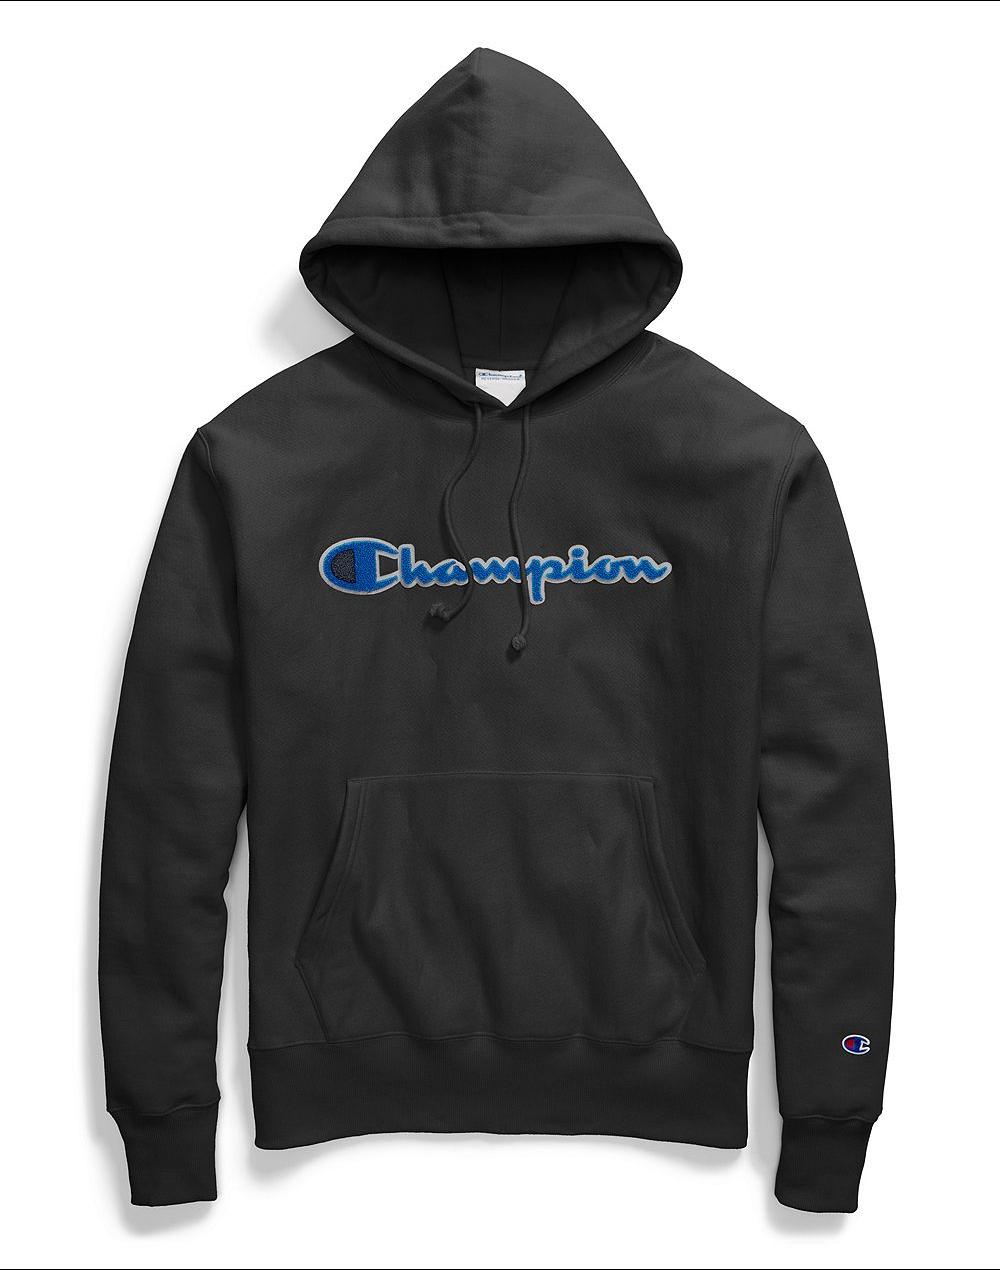 911eee7783a Champion Reverse Weave Chenille Logo Pullover Hoodie - Black - MODA3